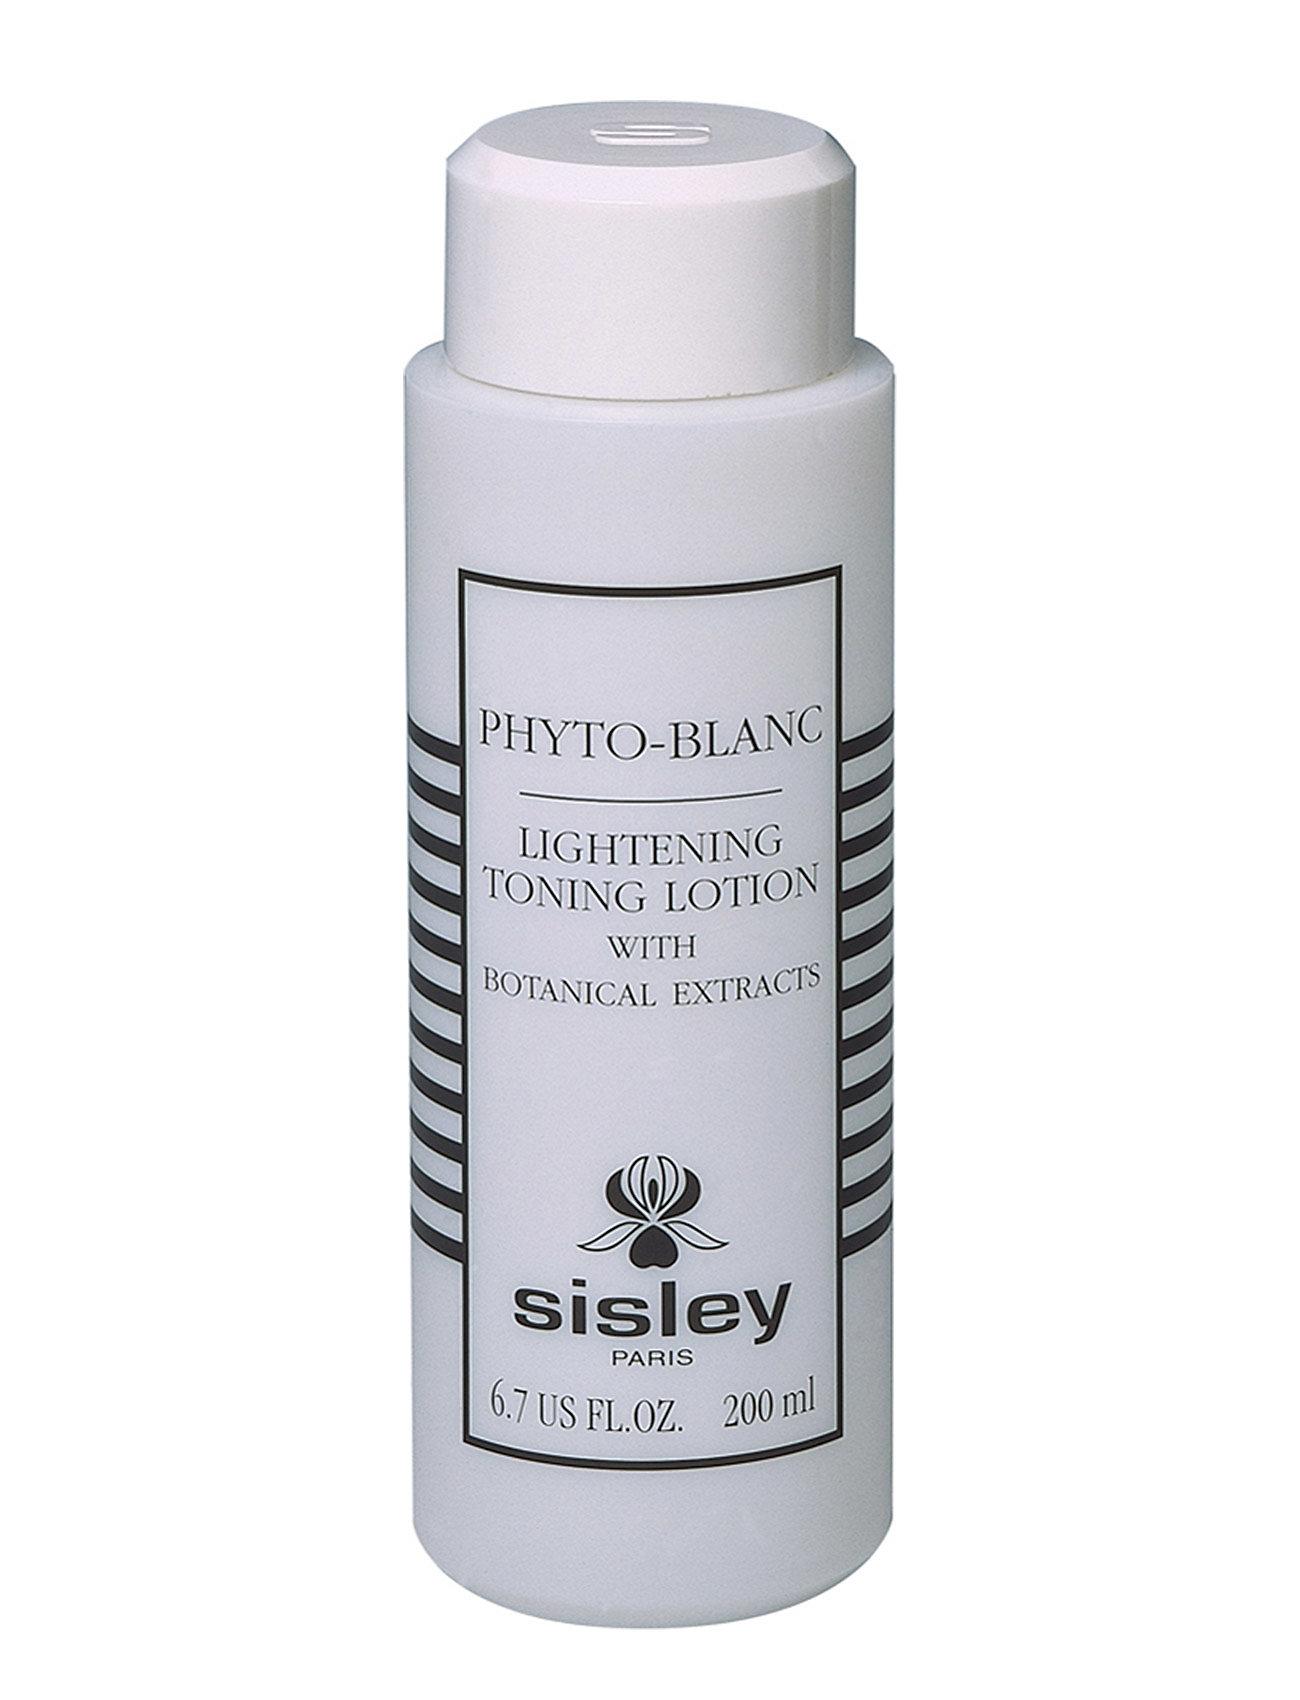 Sisley PH-BLANC LIGHTENING TONING LOTION 200ml - CLEAR